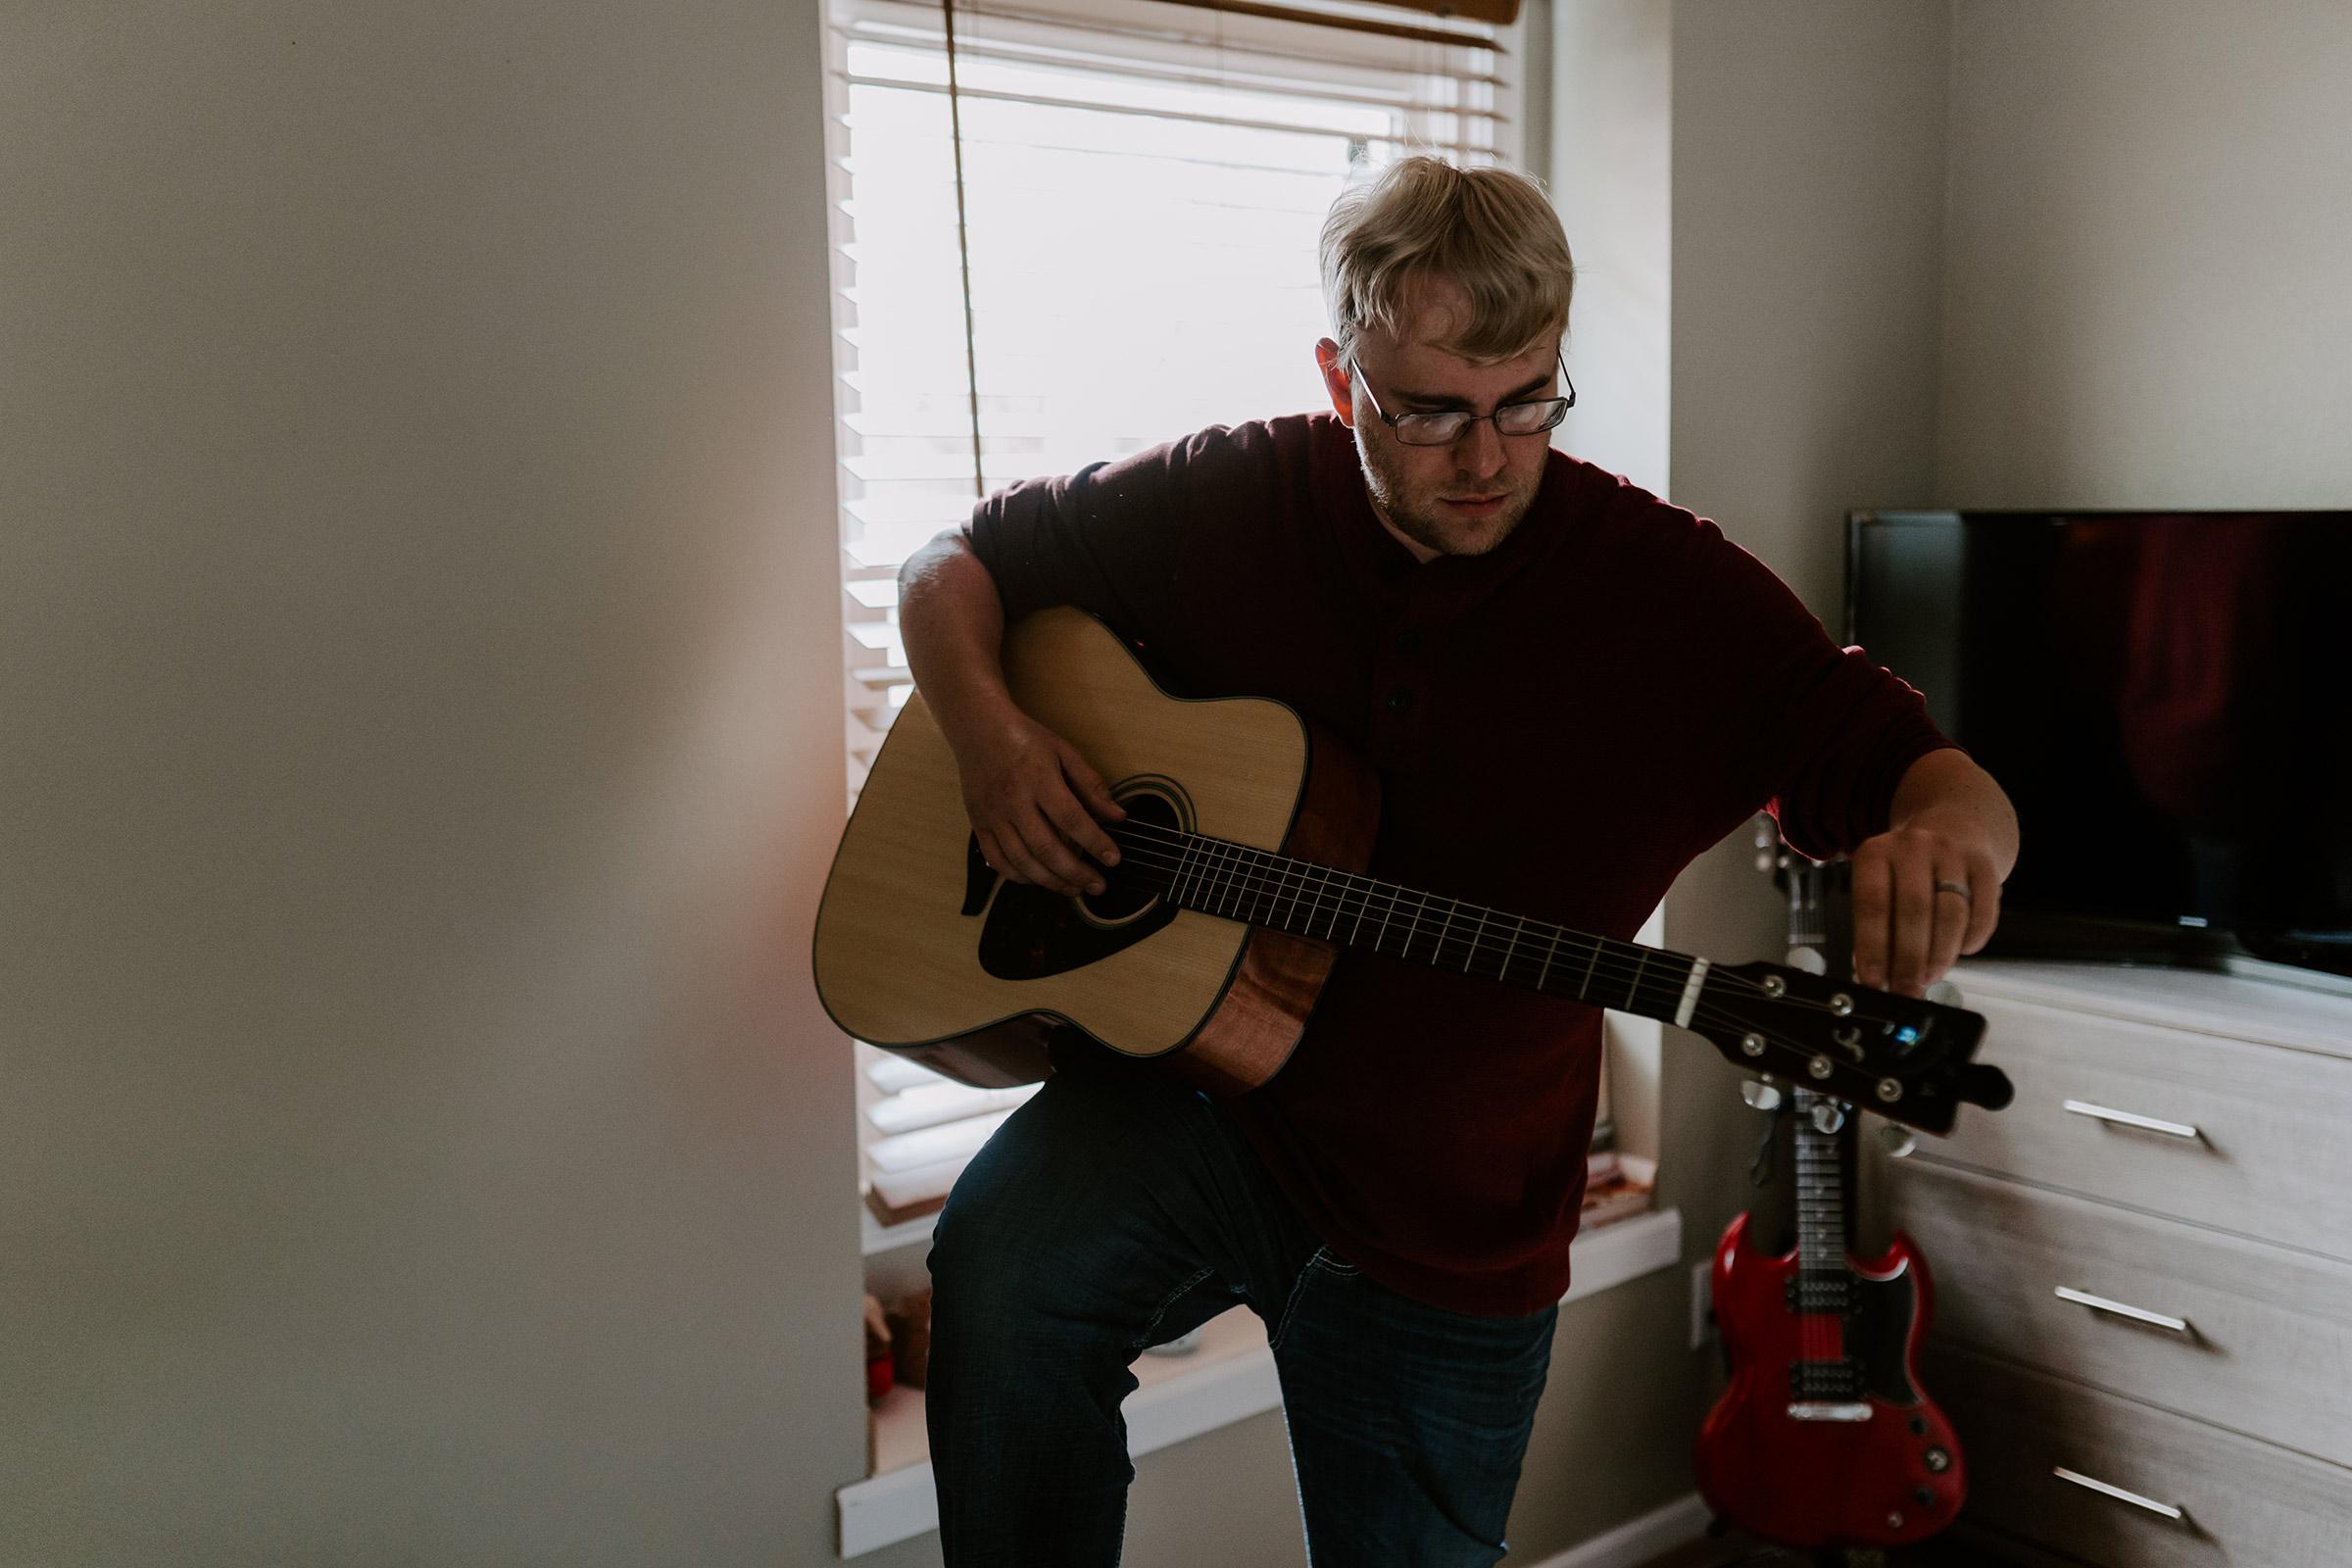 dad-tuning-guitar-maternity-desmoines-iowa-raelyn-ramey-photography-17.jpg